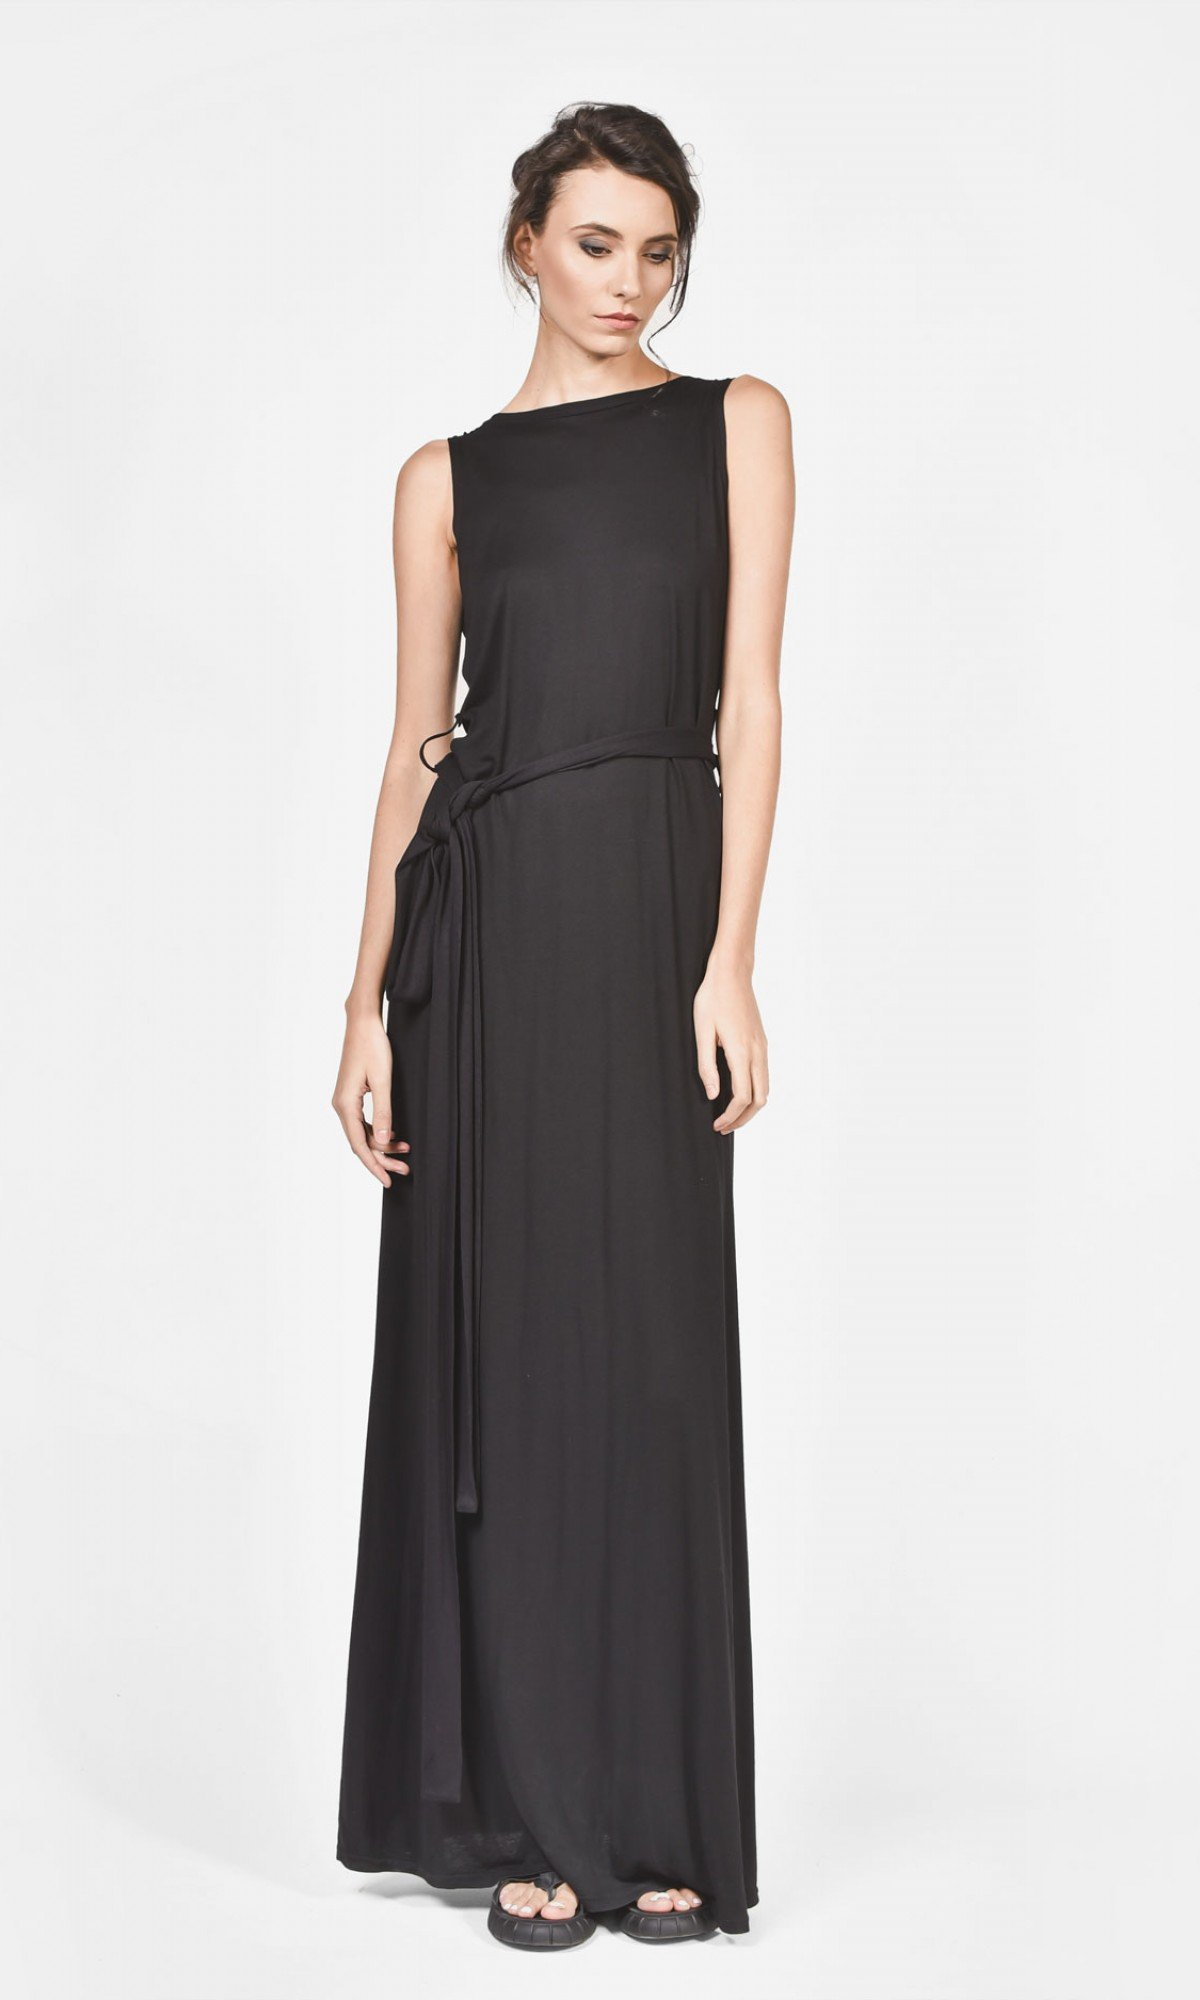 Stunning Bare back dress A90035